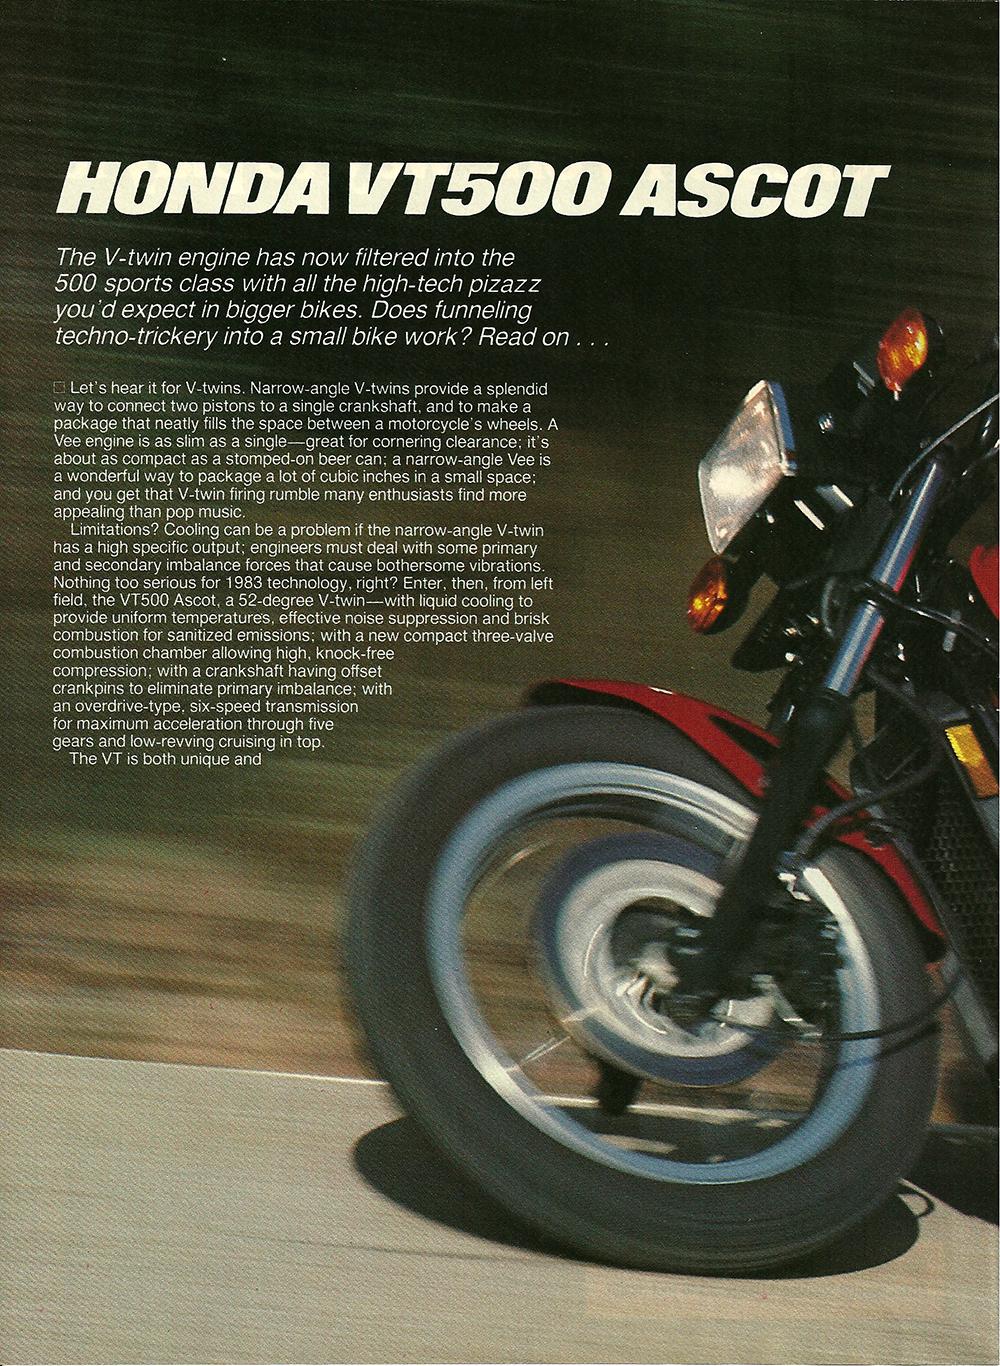 1983 Honda VT500 Ascot road test 1.jpg